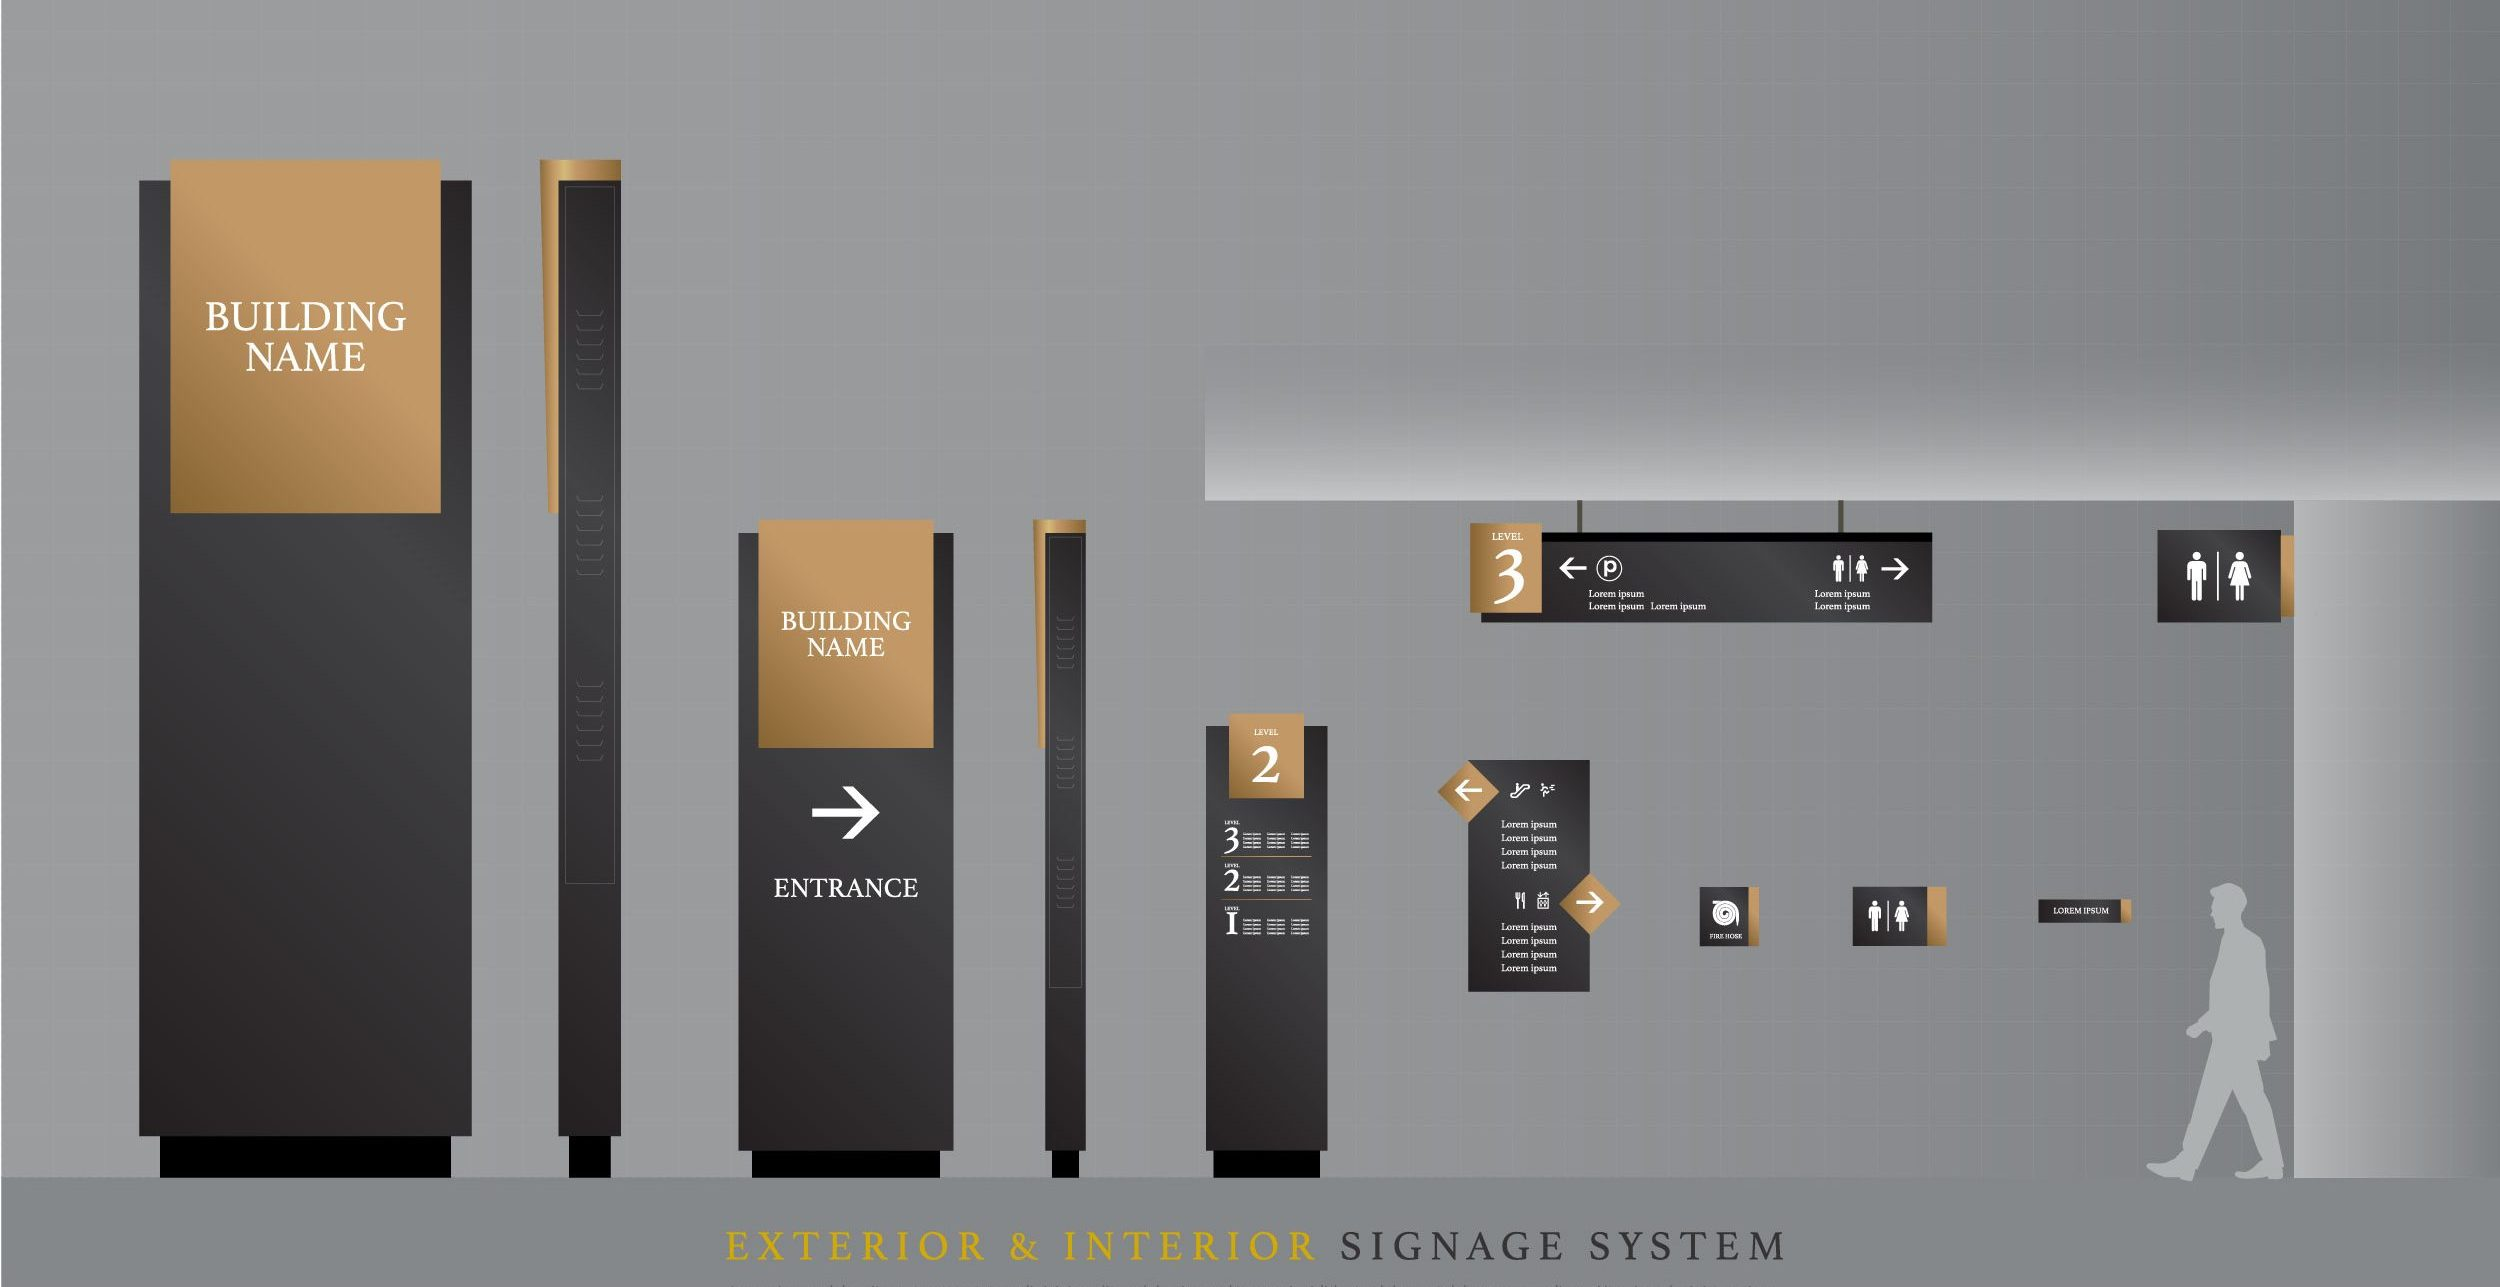 Interior-and-Exterior-Signage-System